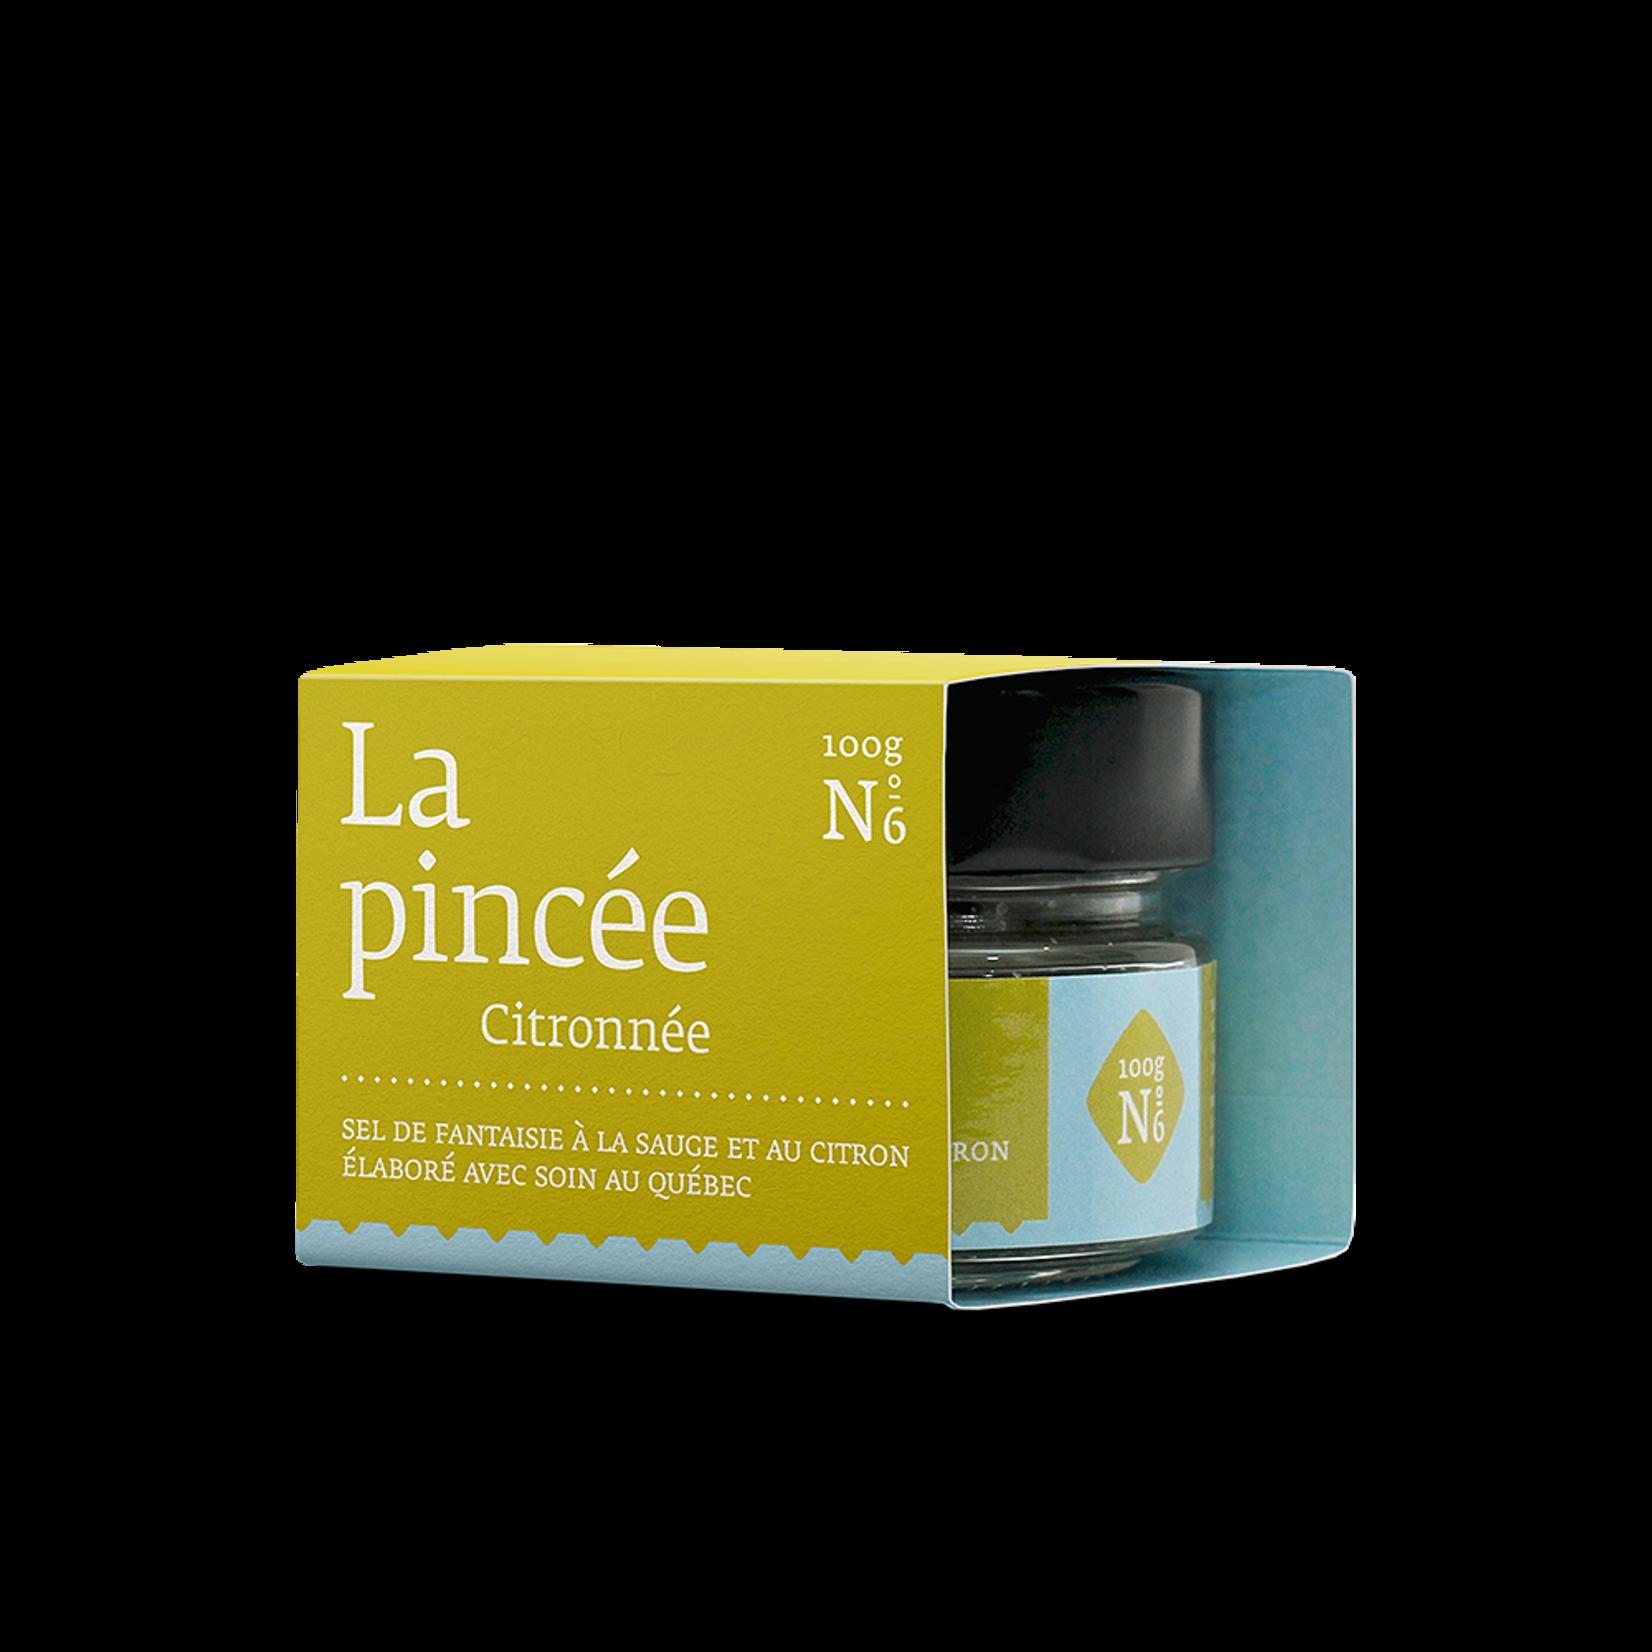 La pincée LA PINCÉE citronnée no6